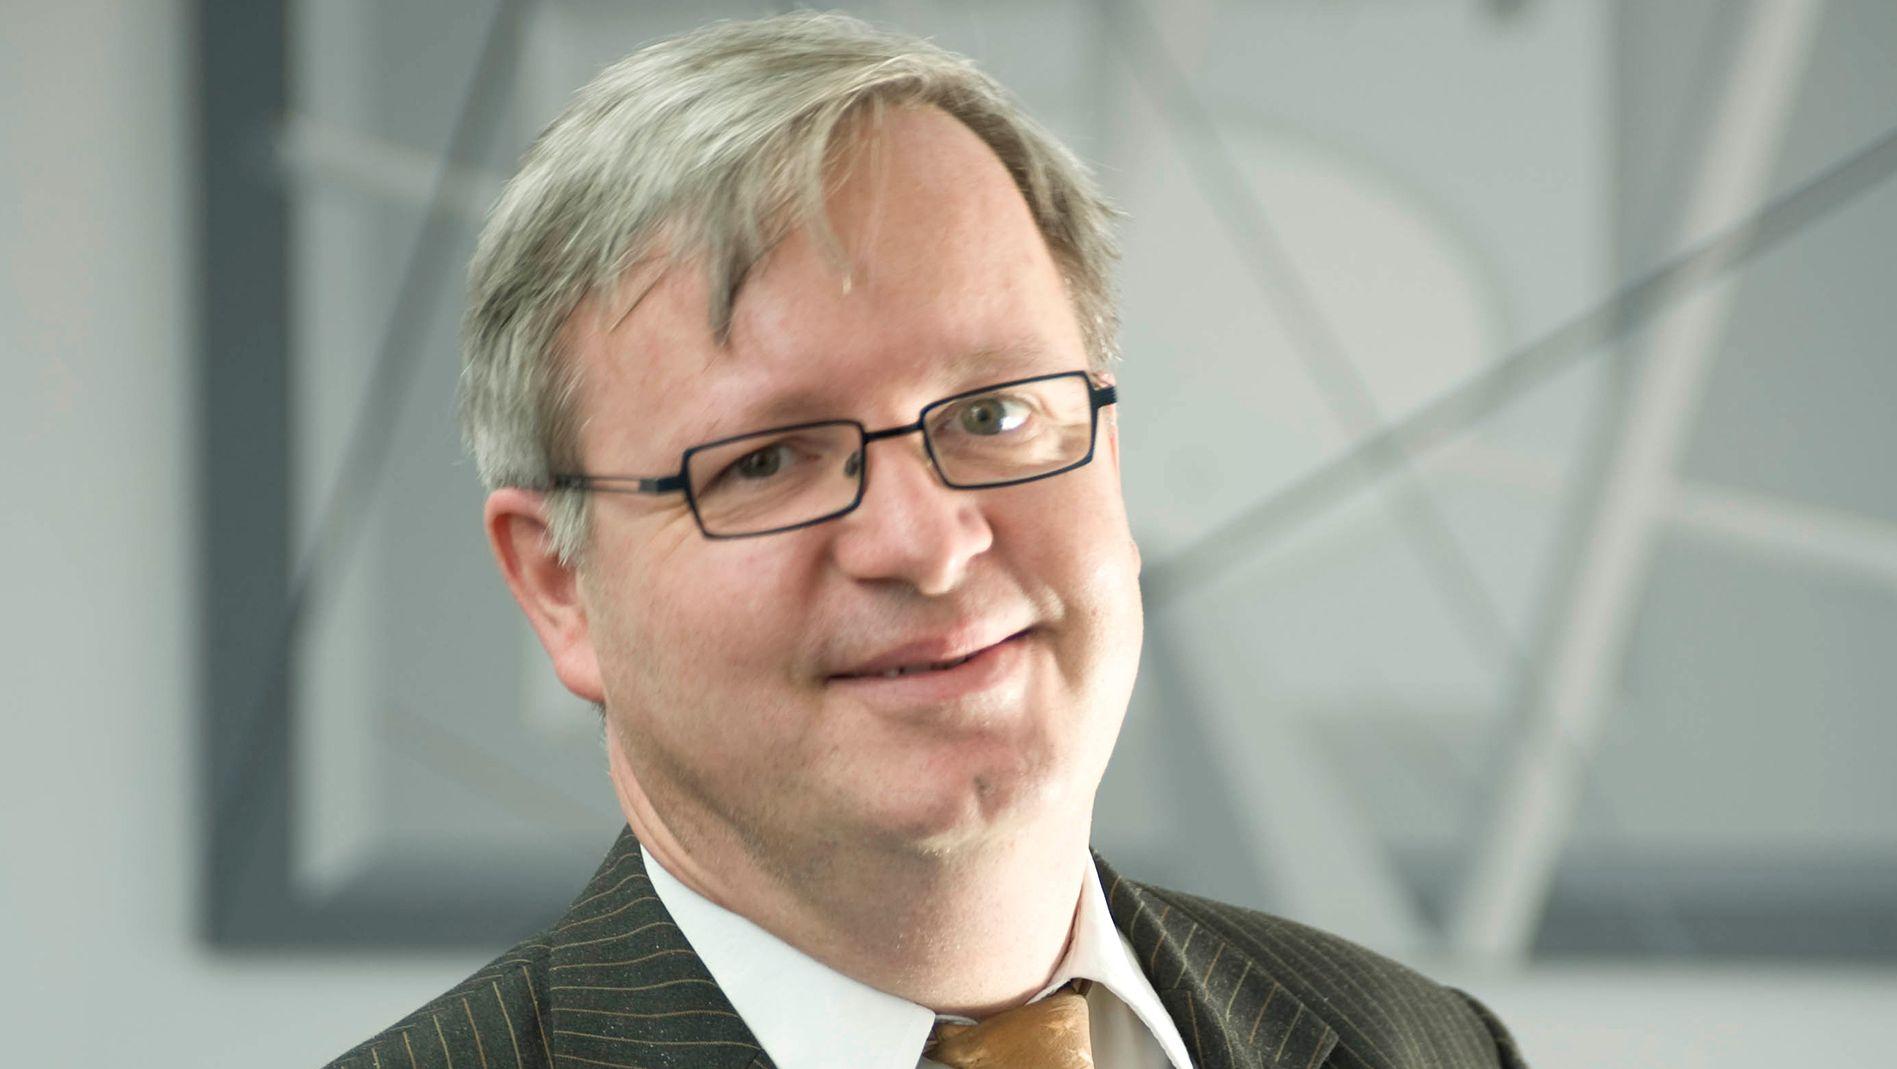 Stefan Eirich